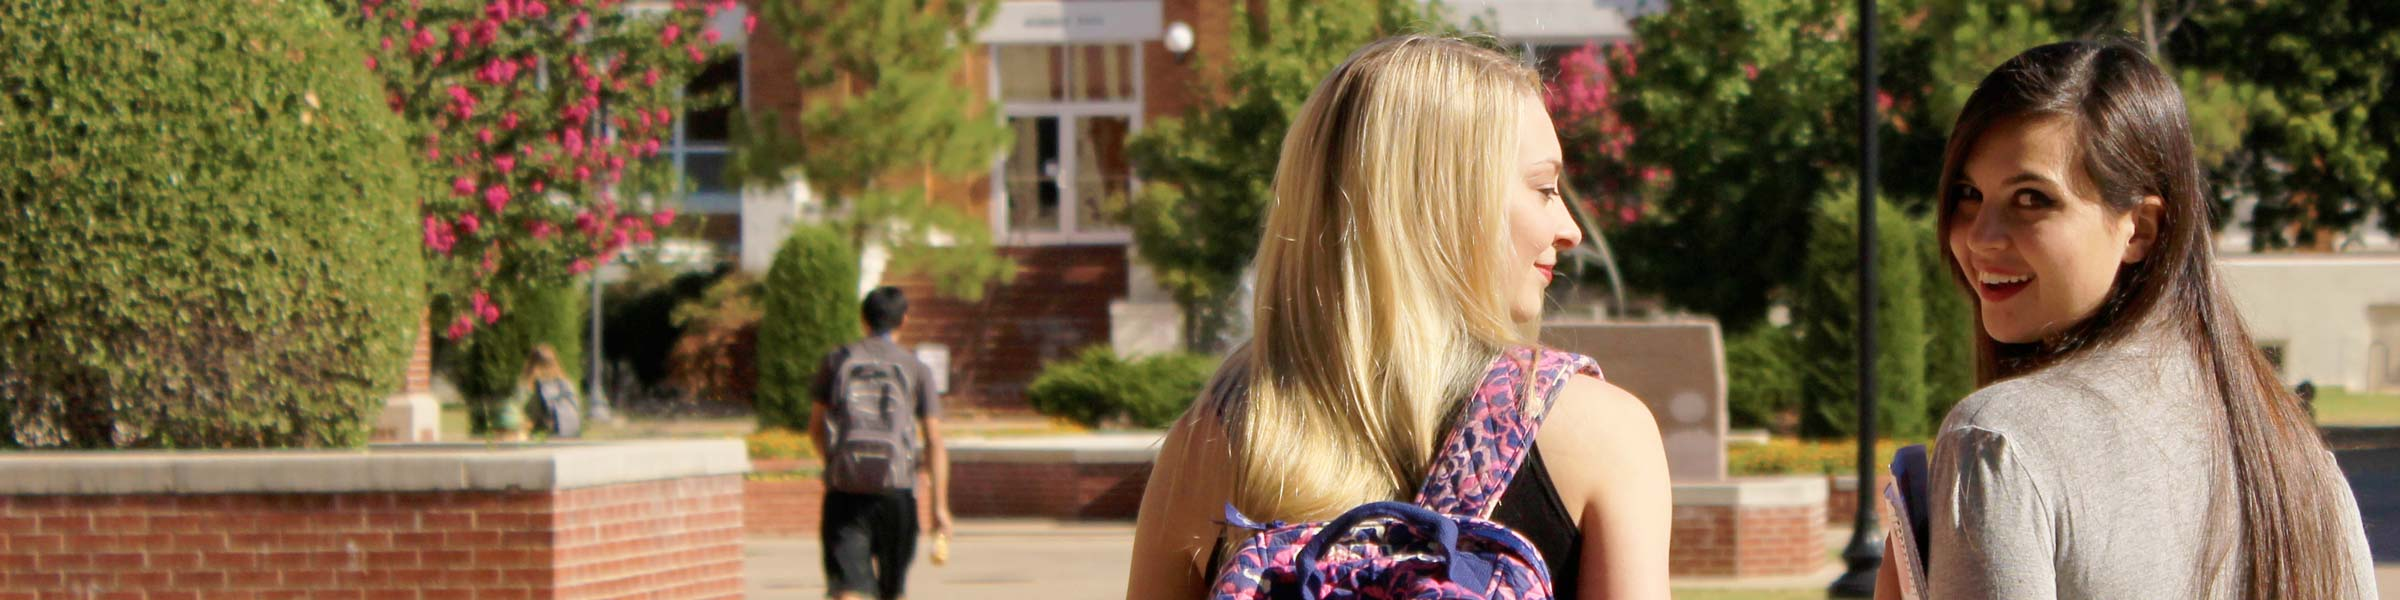 students walking on plaza